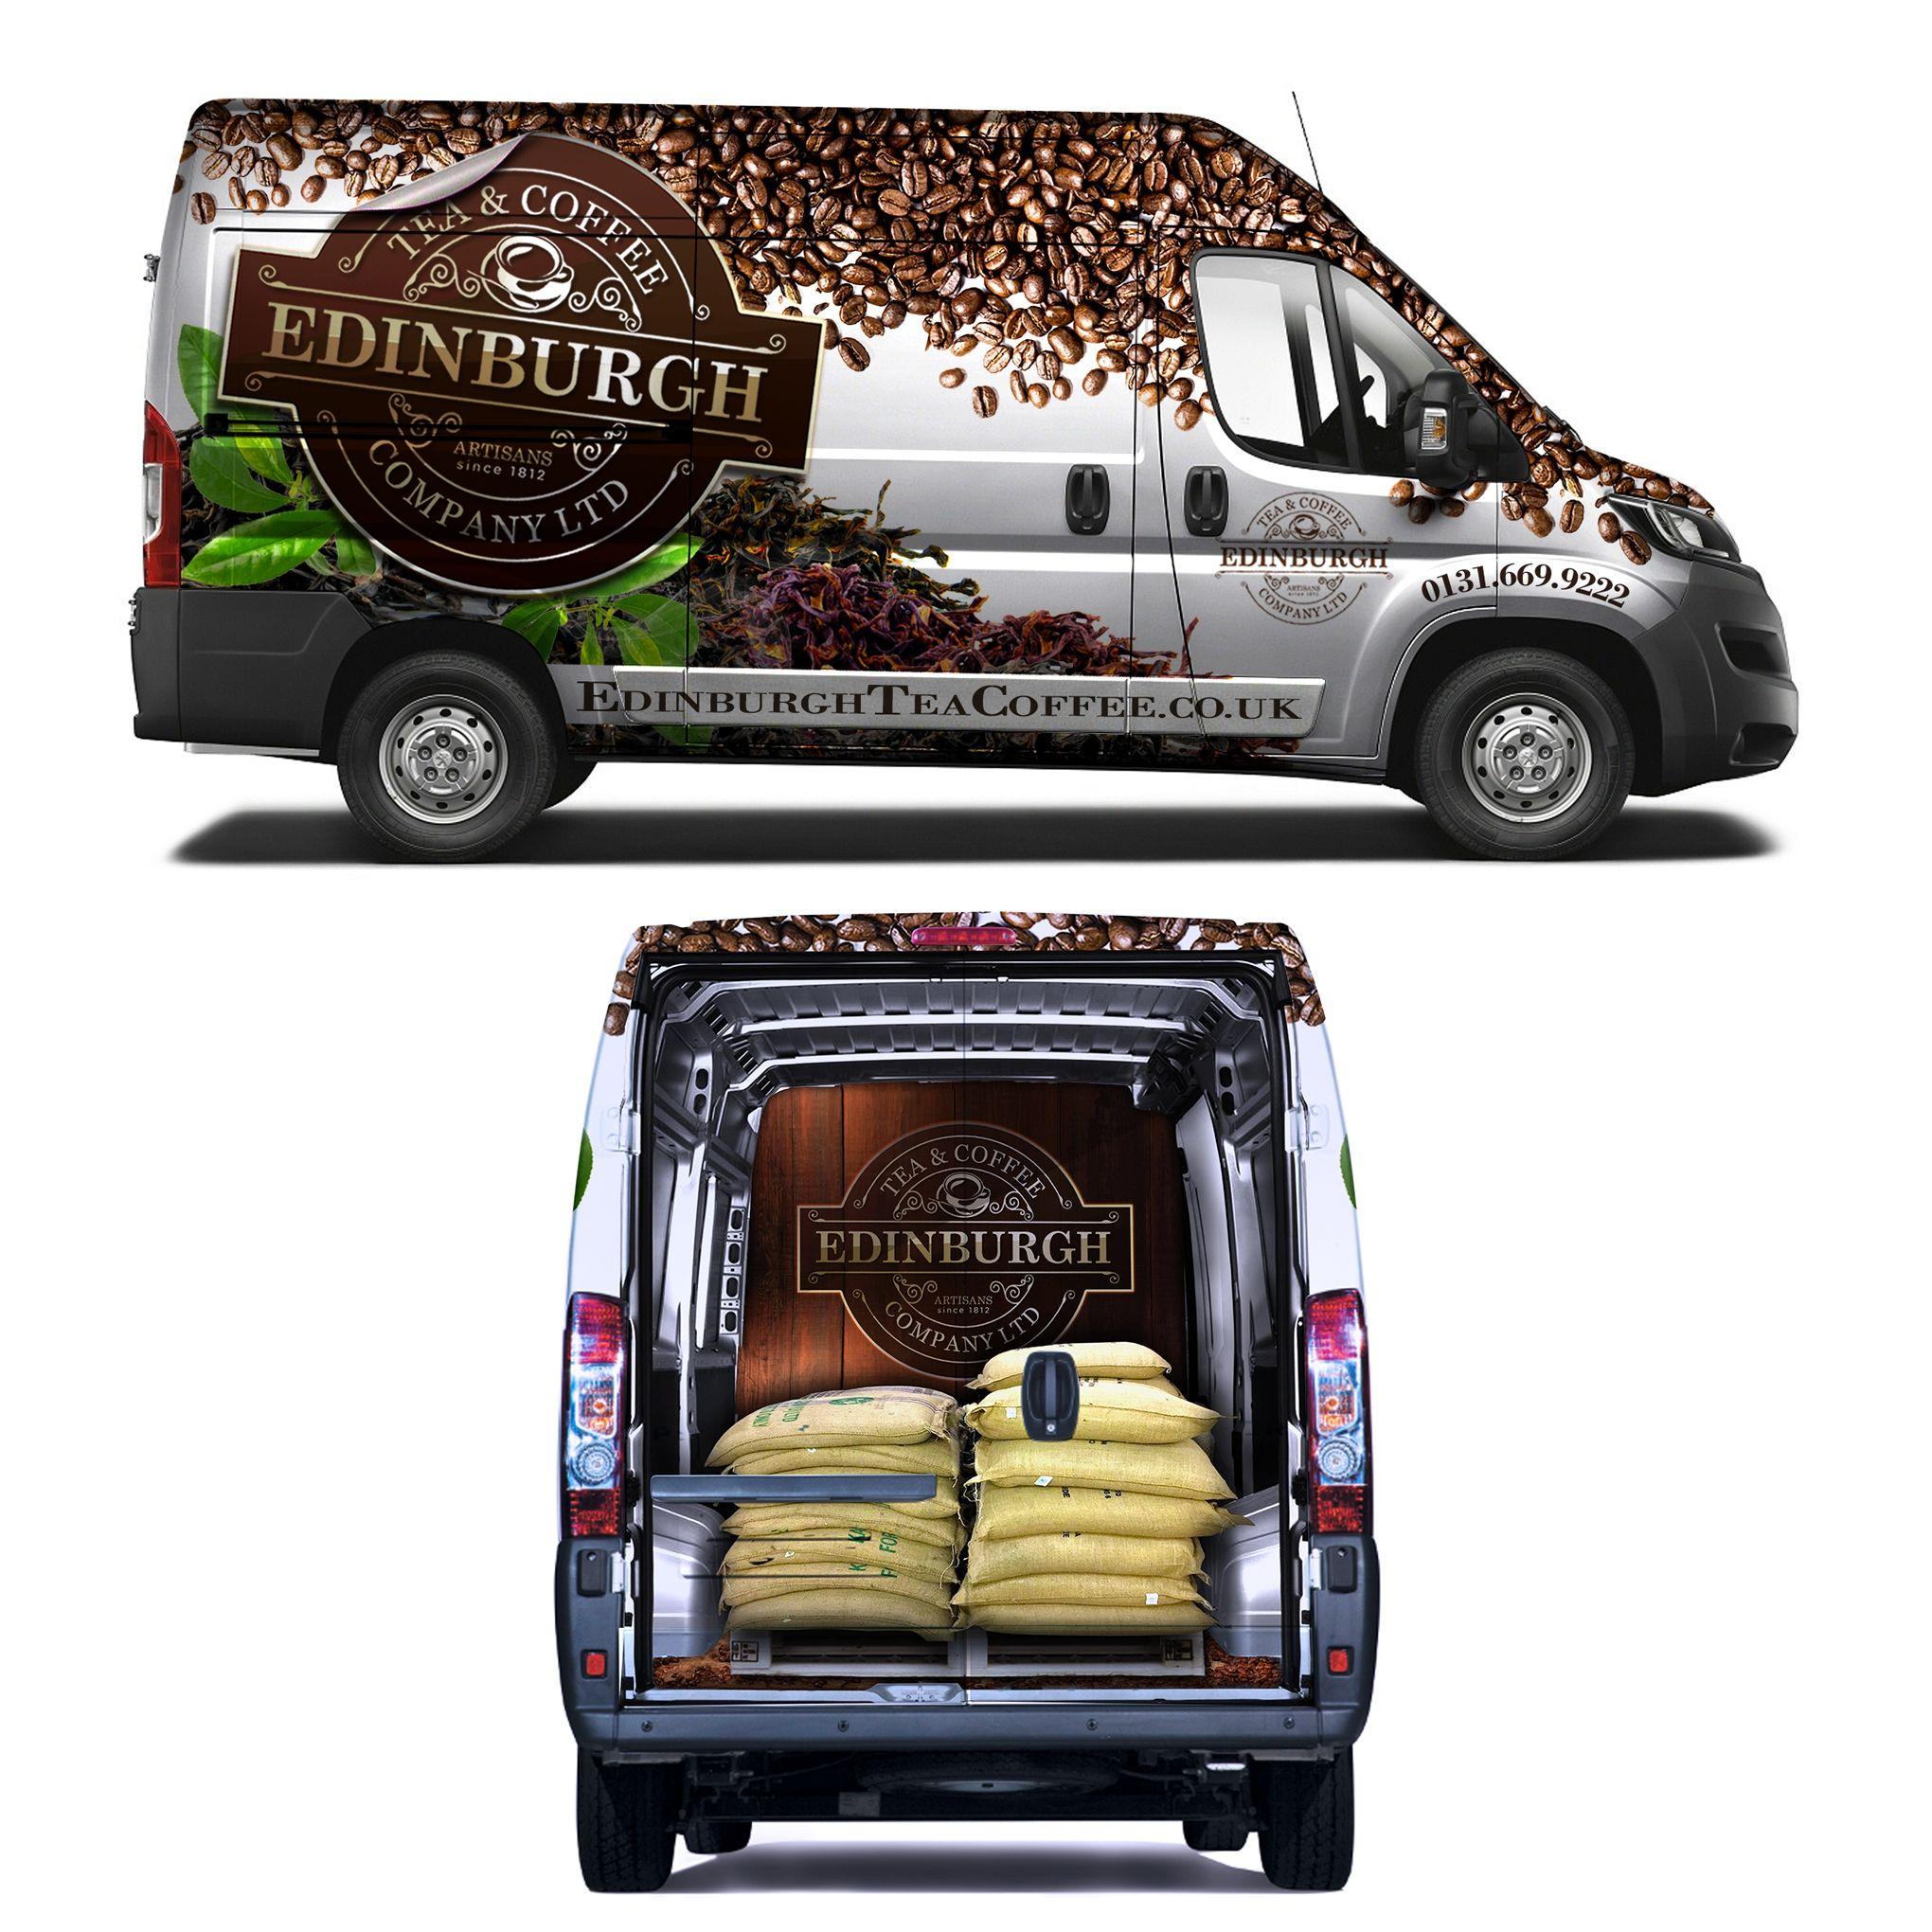 Design car contest - Designs Design A Show Stopping Van Wrap For Edinburgh Tea And Coffee Co